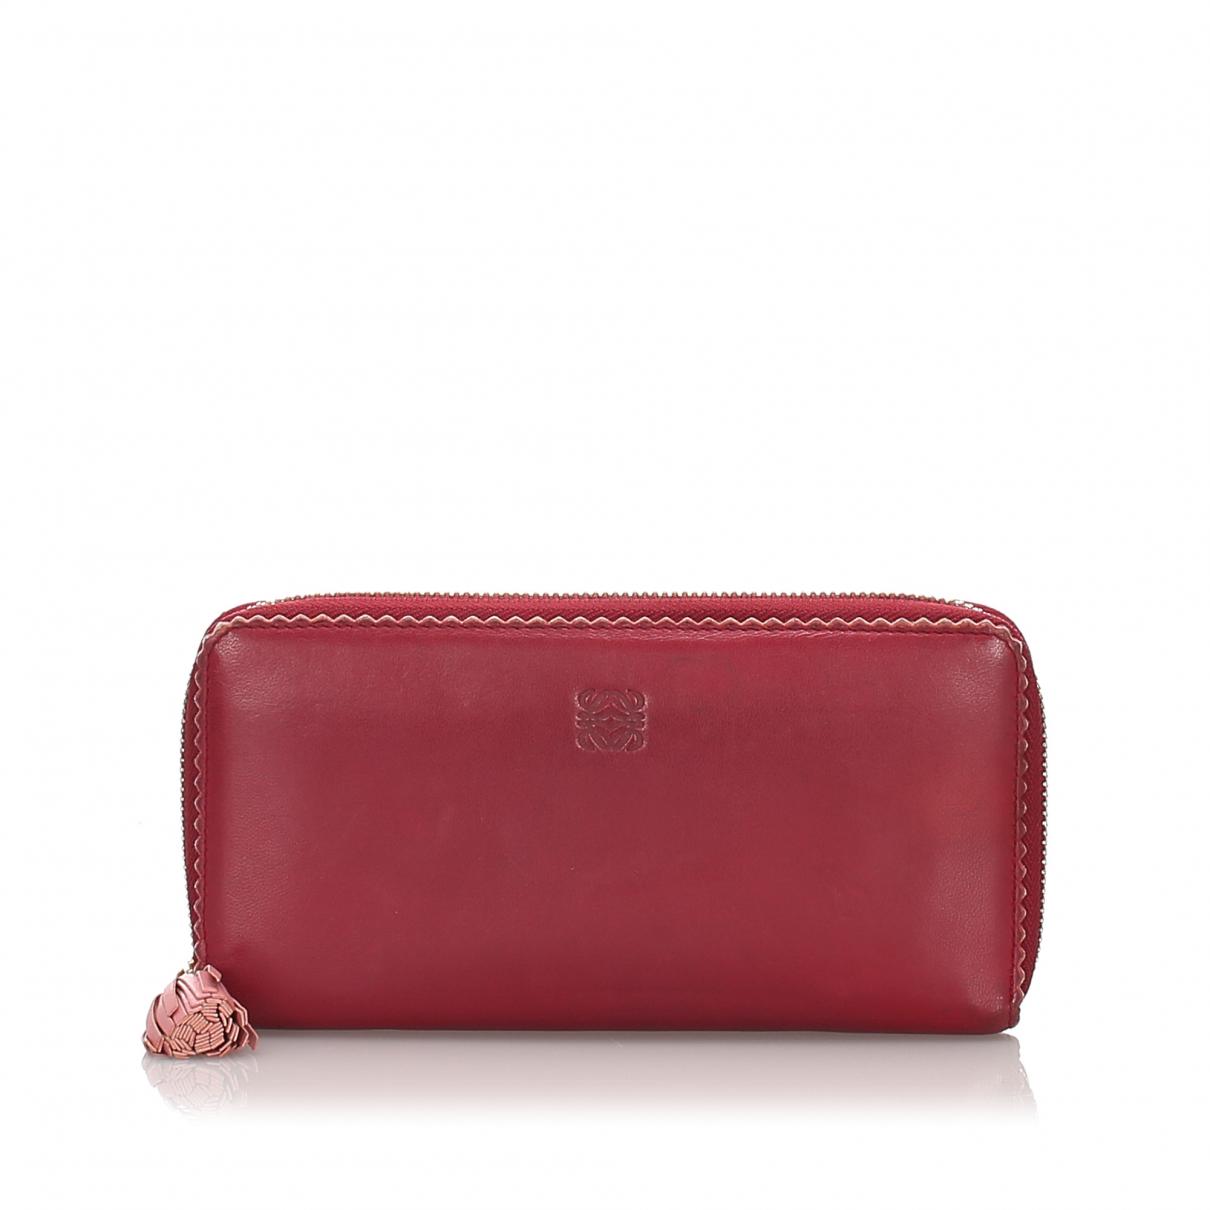 Loewe - Portefeuille   pour femme en cuir - rouge